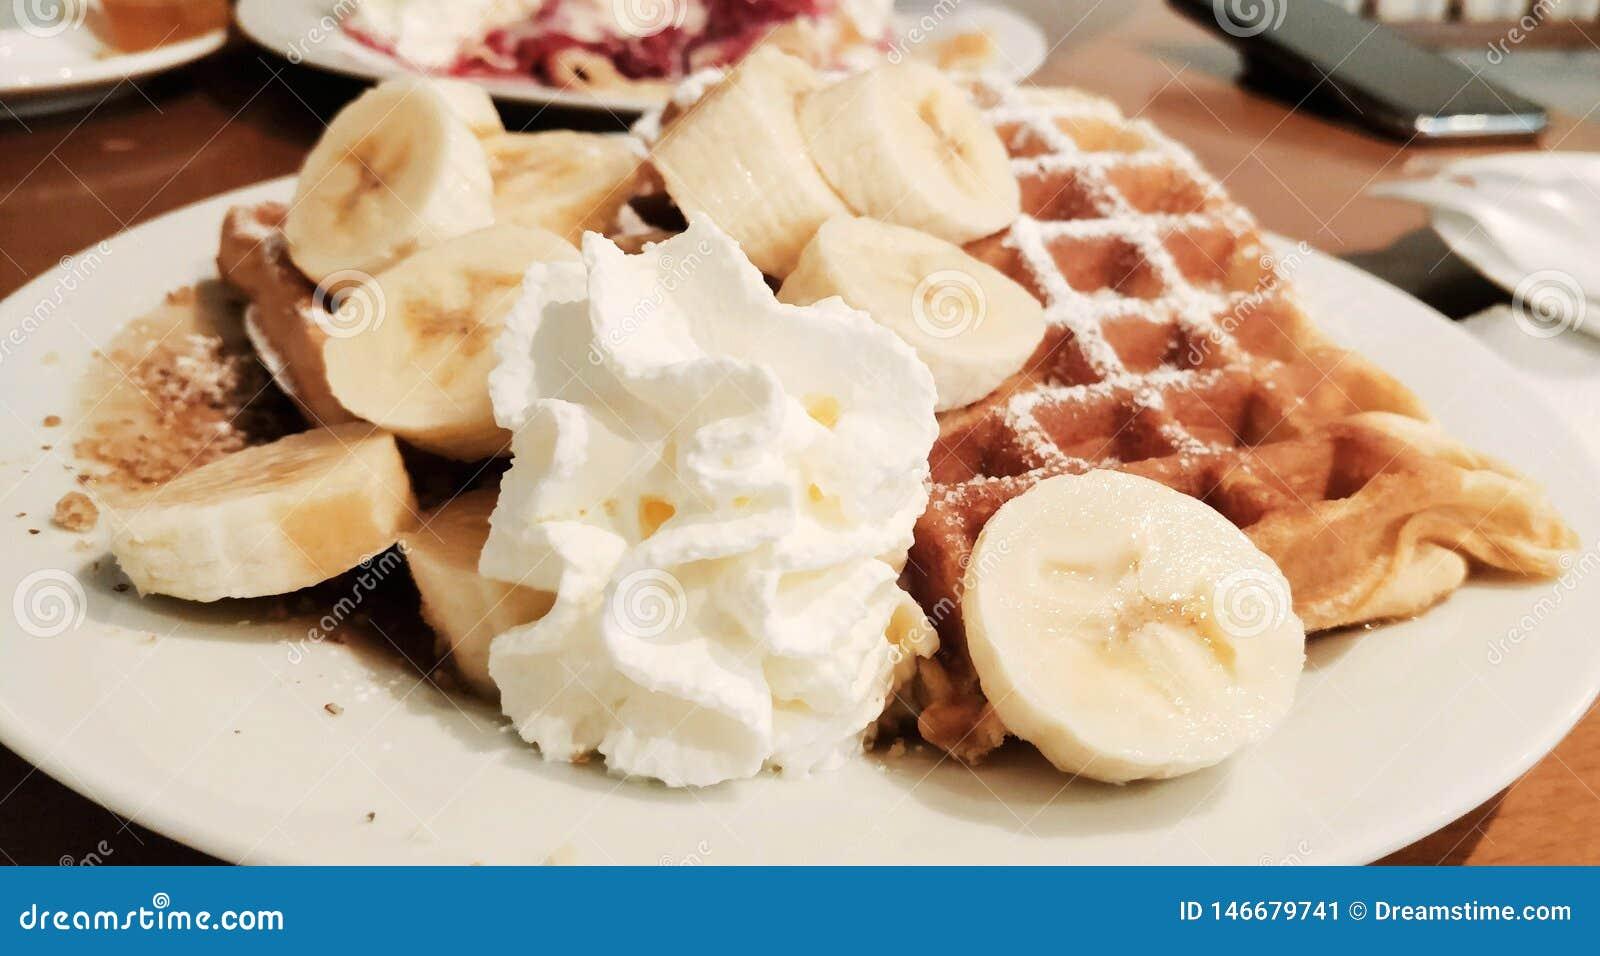 Yummy wafle